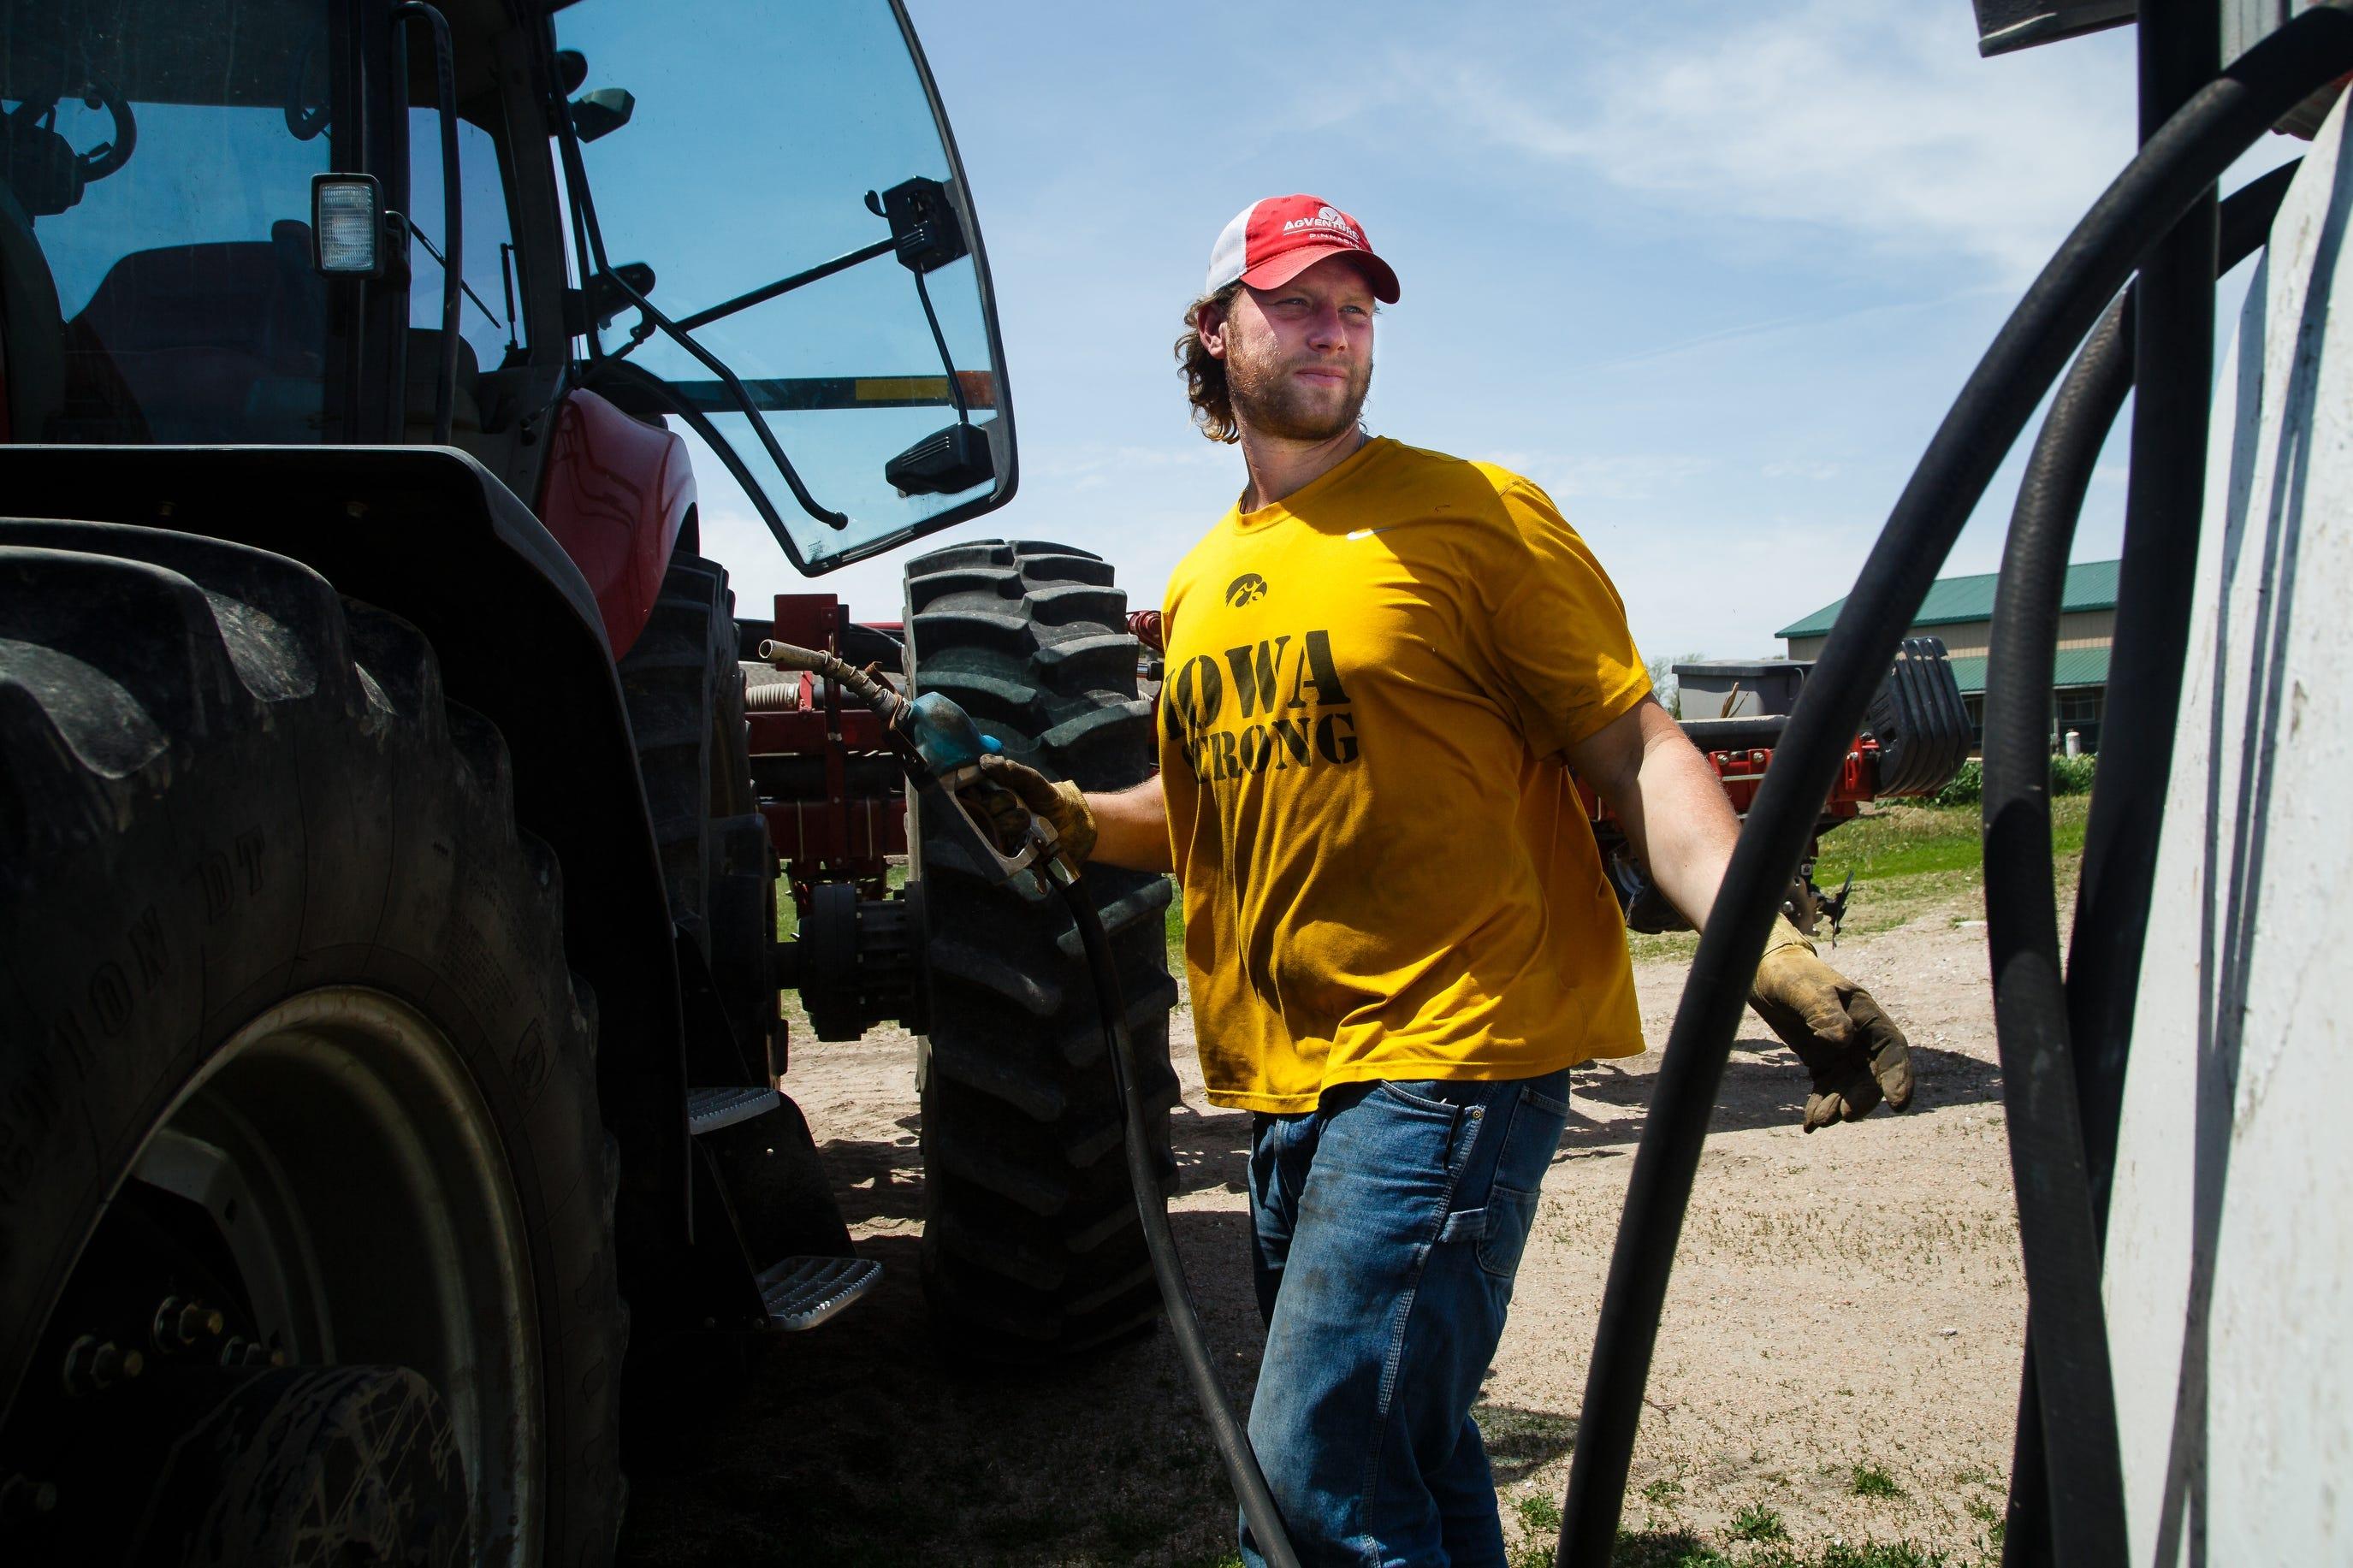 Photos: Former Hawkeye football star Drew Ott finds new dream on his Nebraska family farm